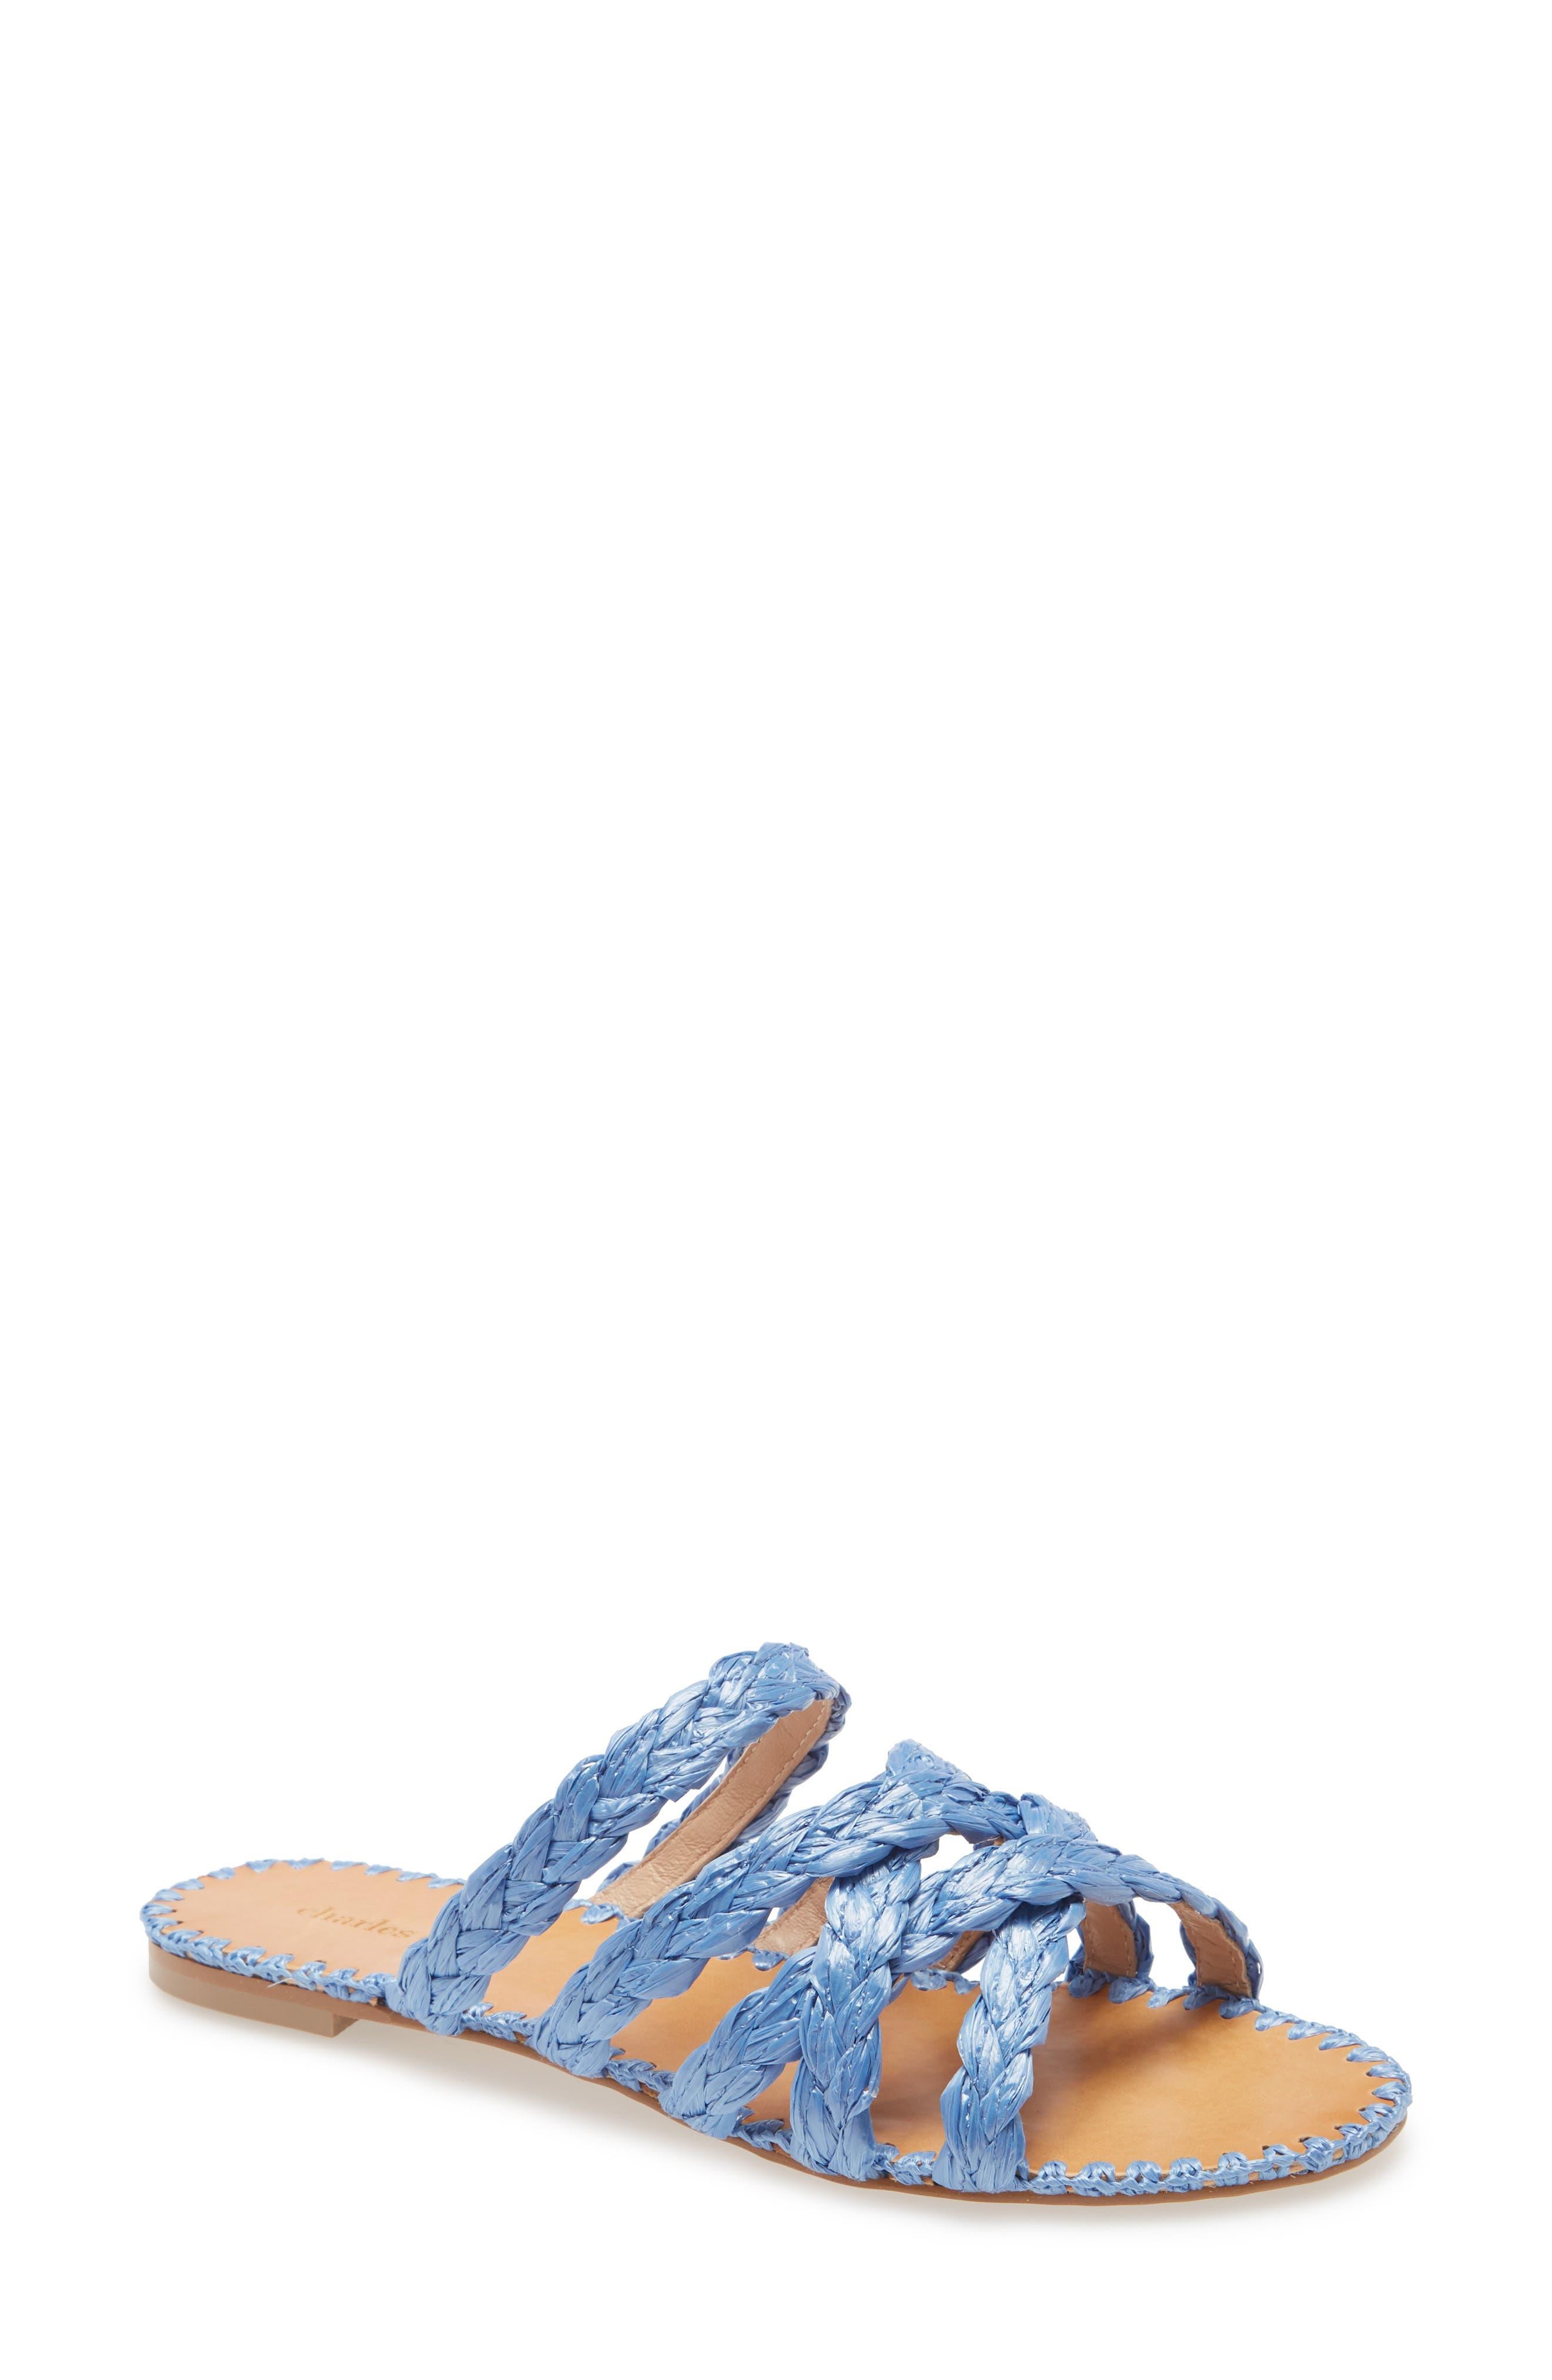 Stanza Slide Sandal